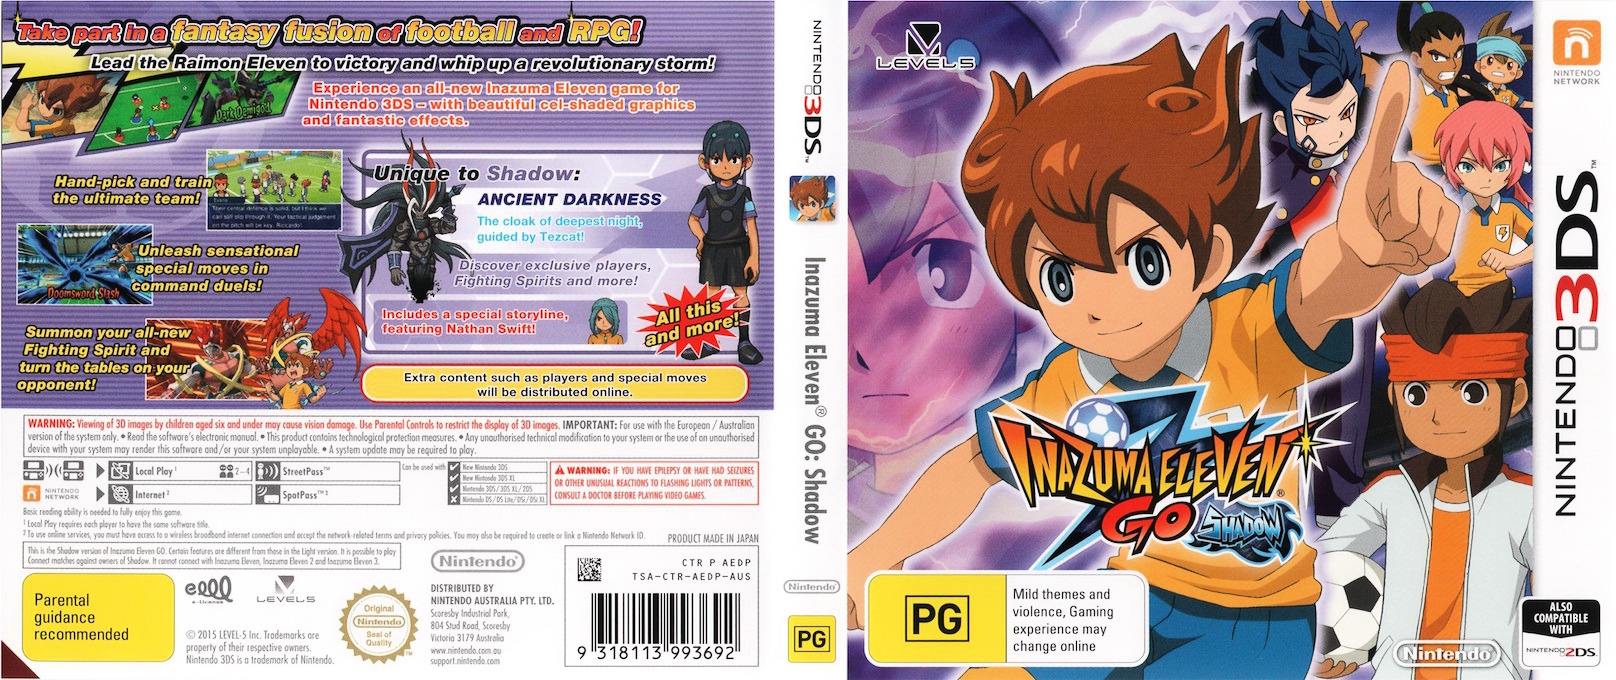 AEDP  Inazuma Eleven Go  Shadow